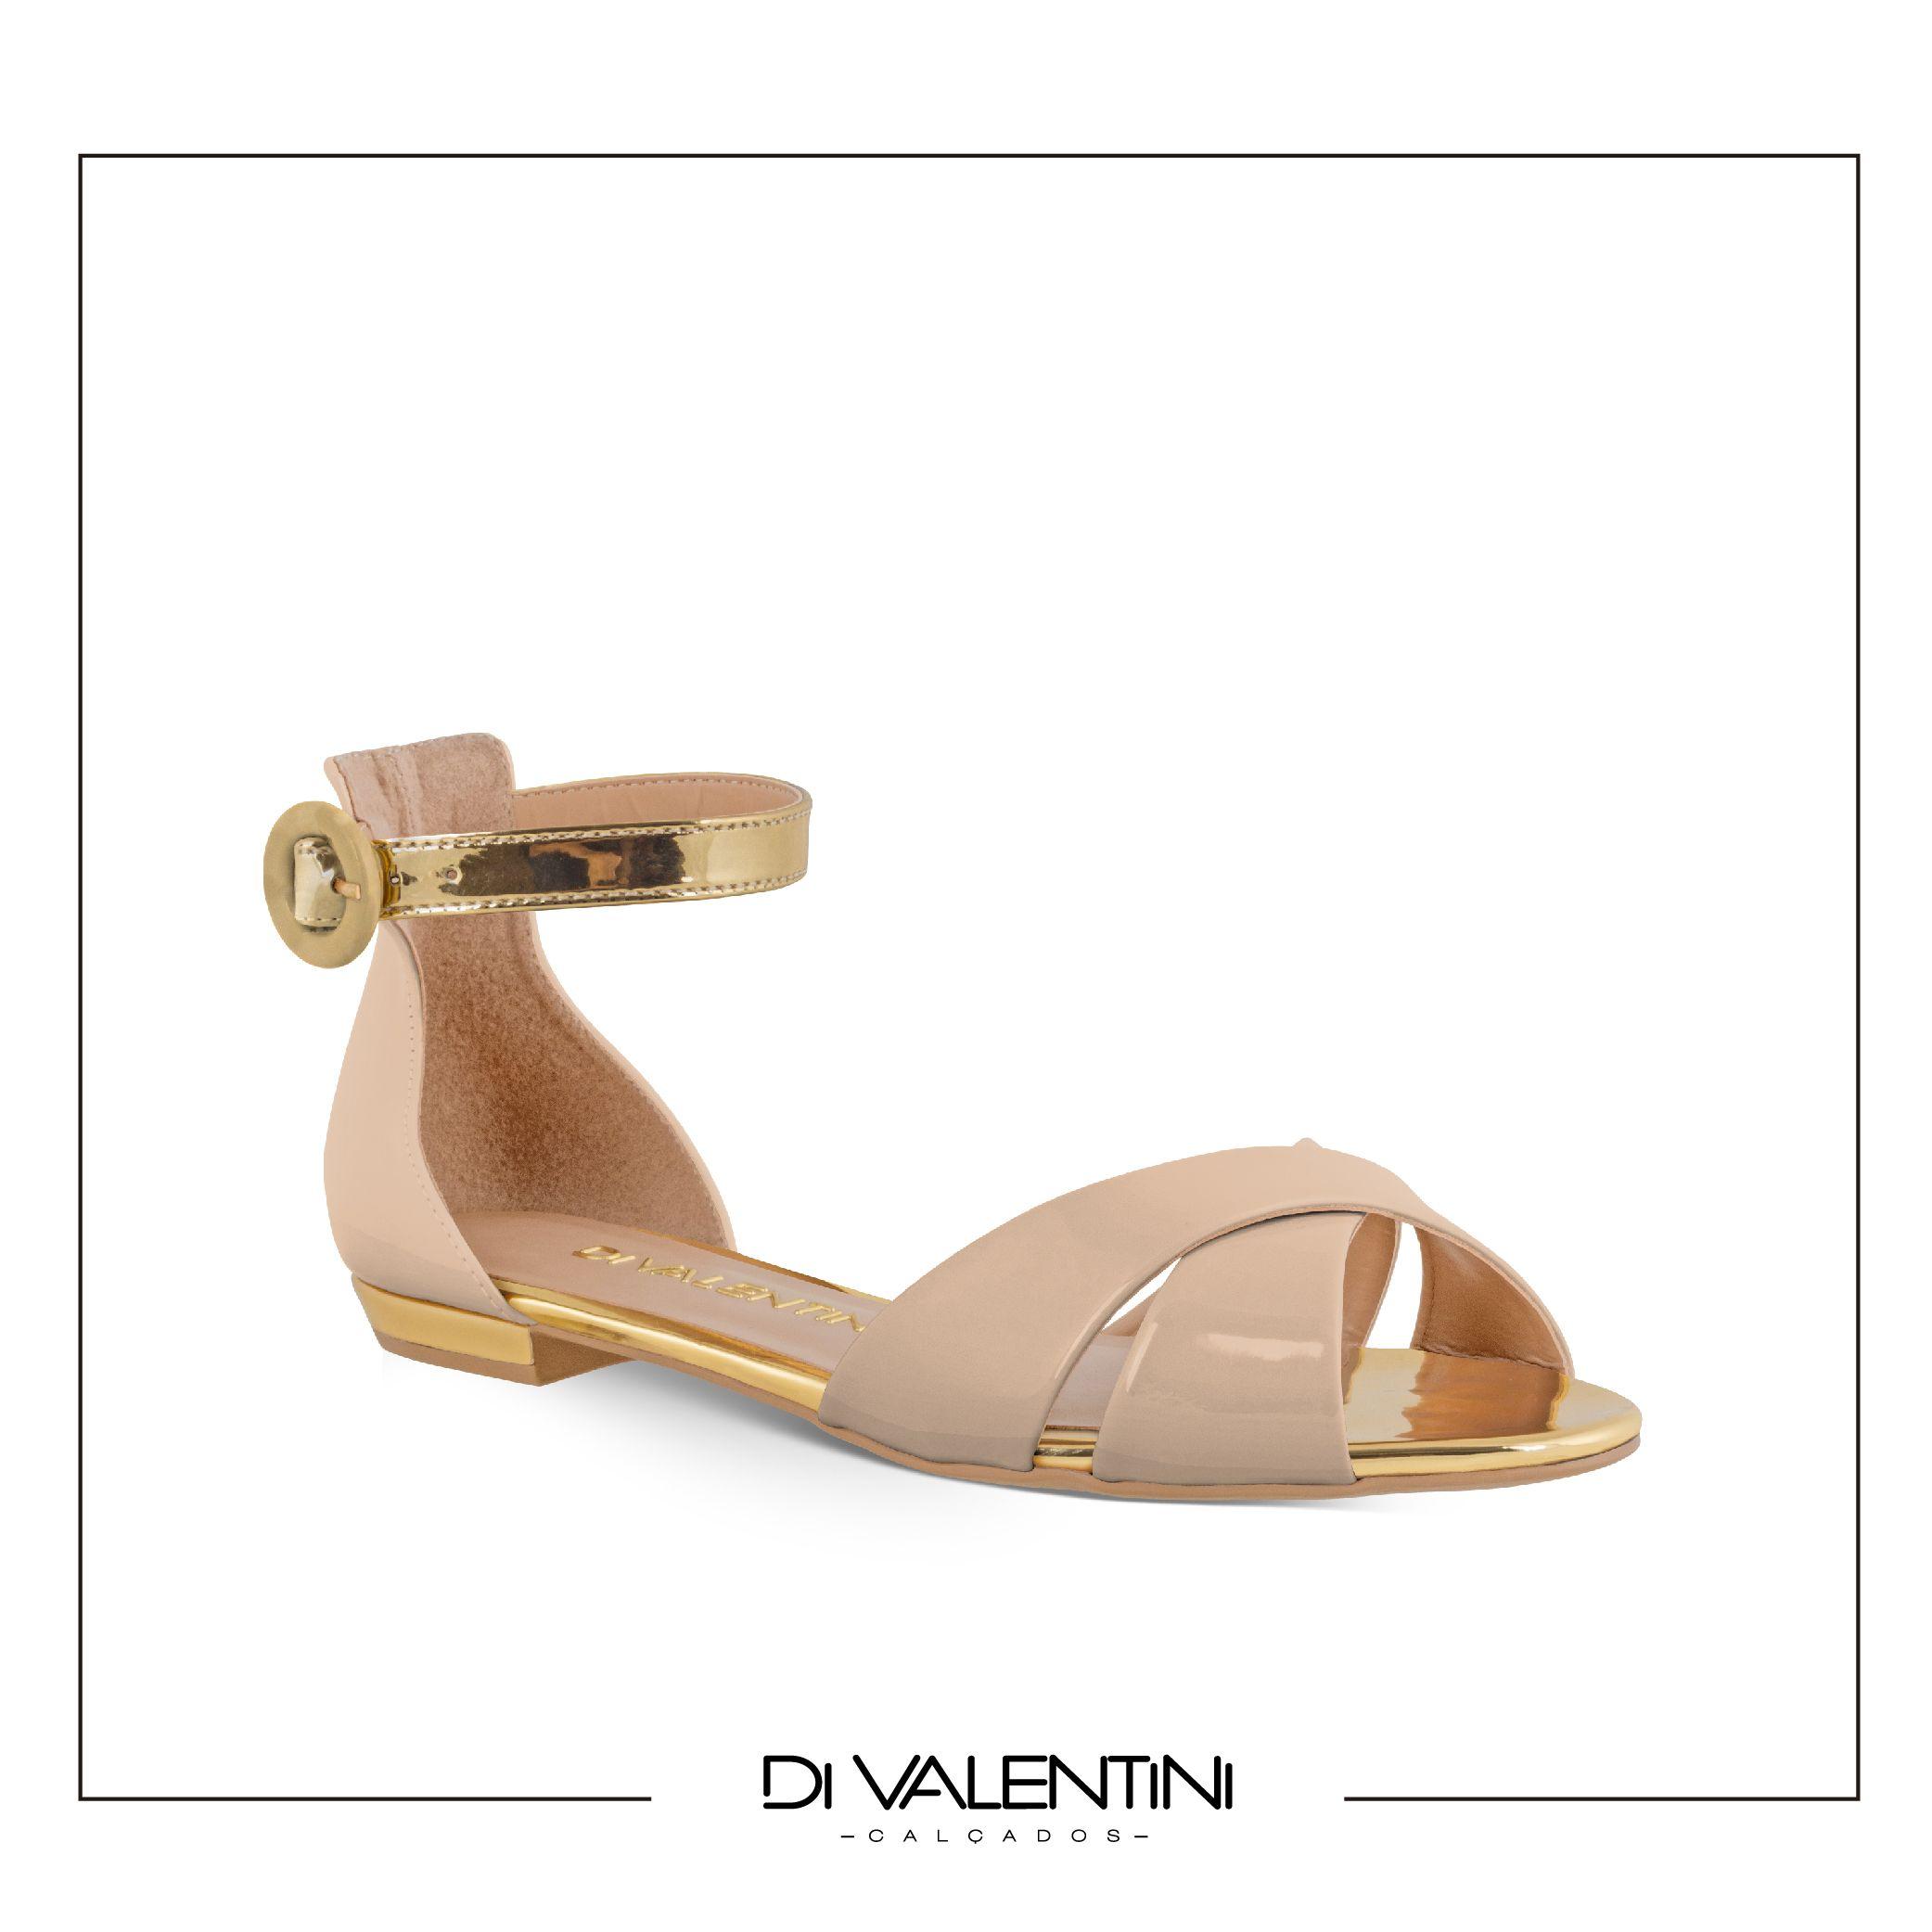 5c2eda3069 Rasteira Di Valentini na loja Fashion Calçados . ♥